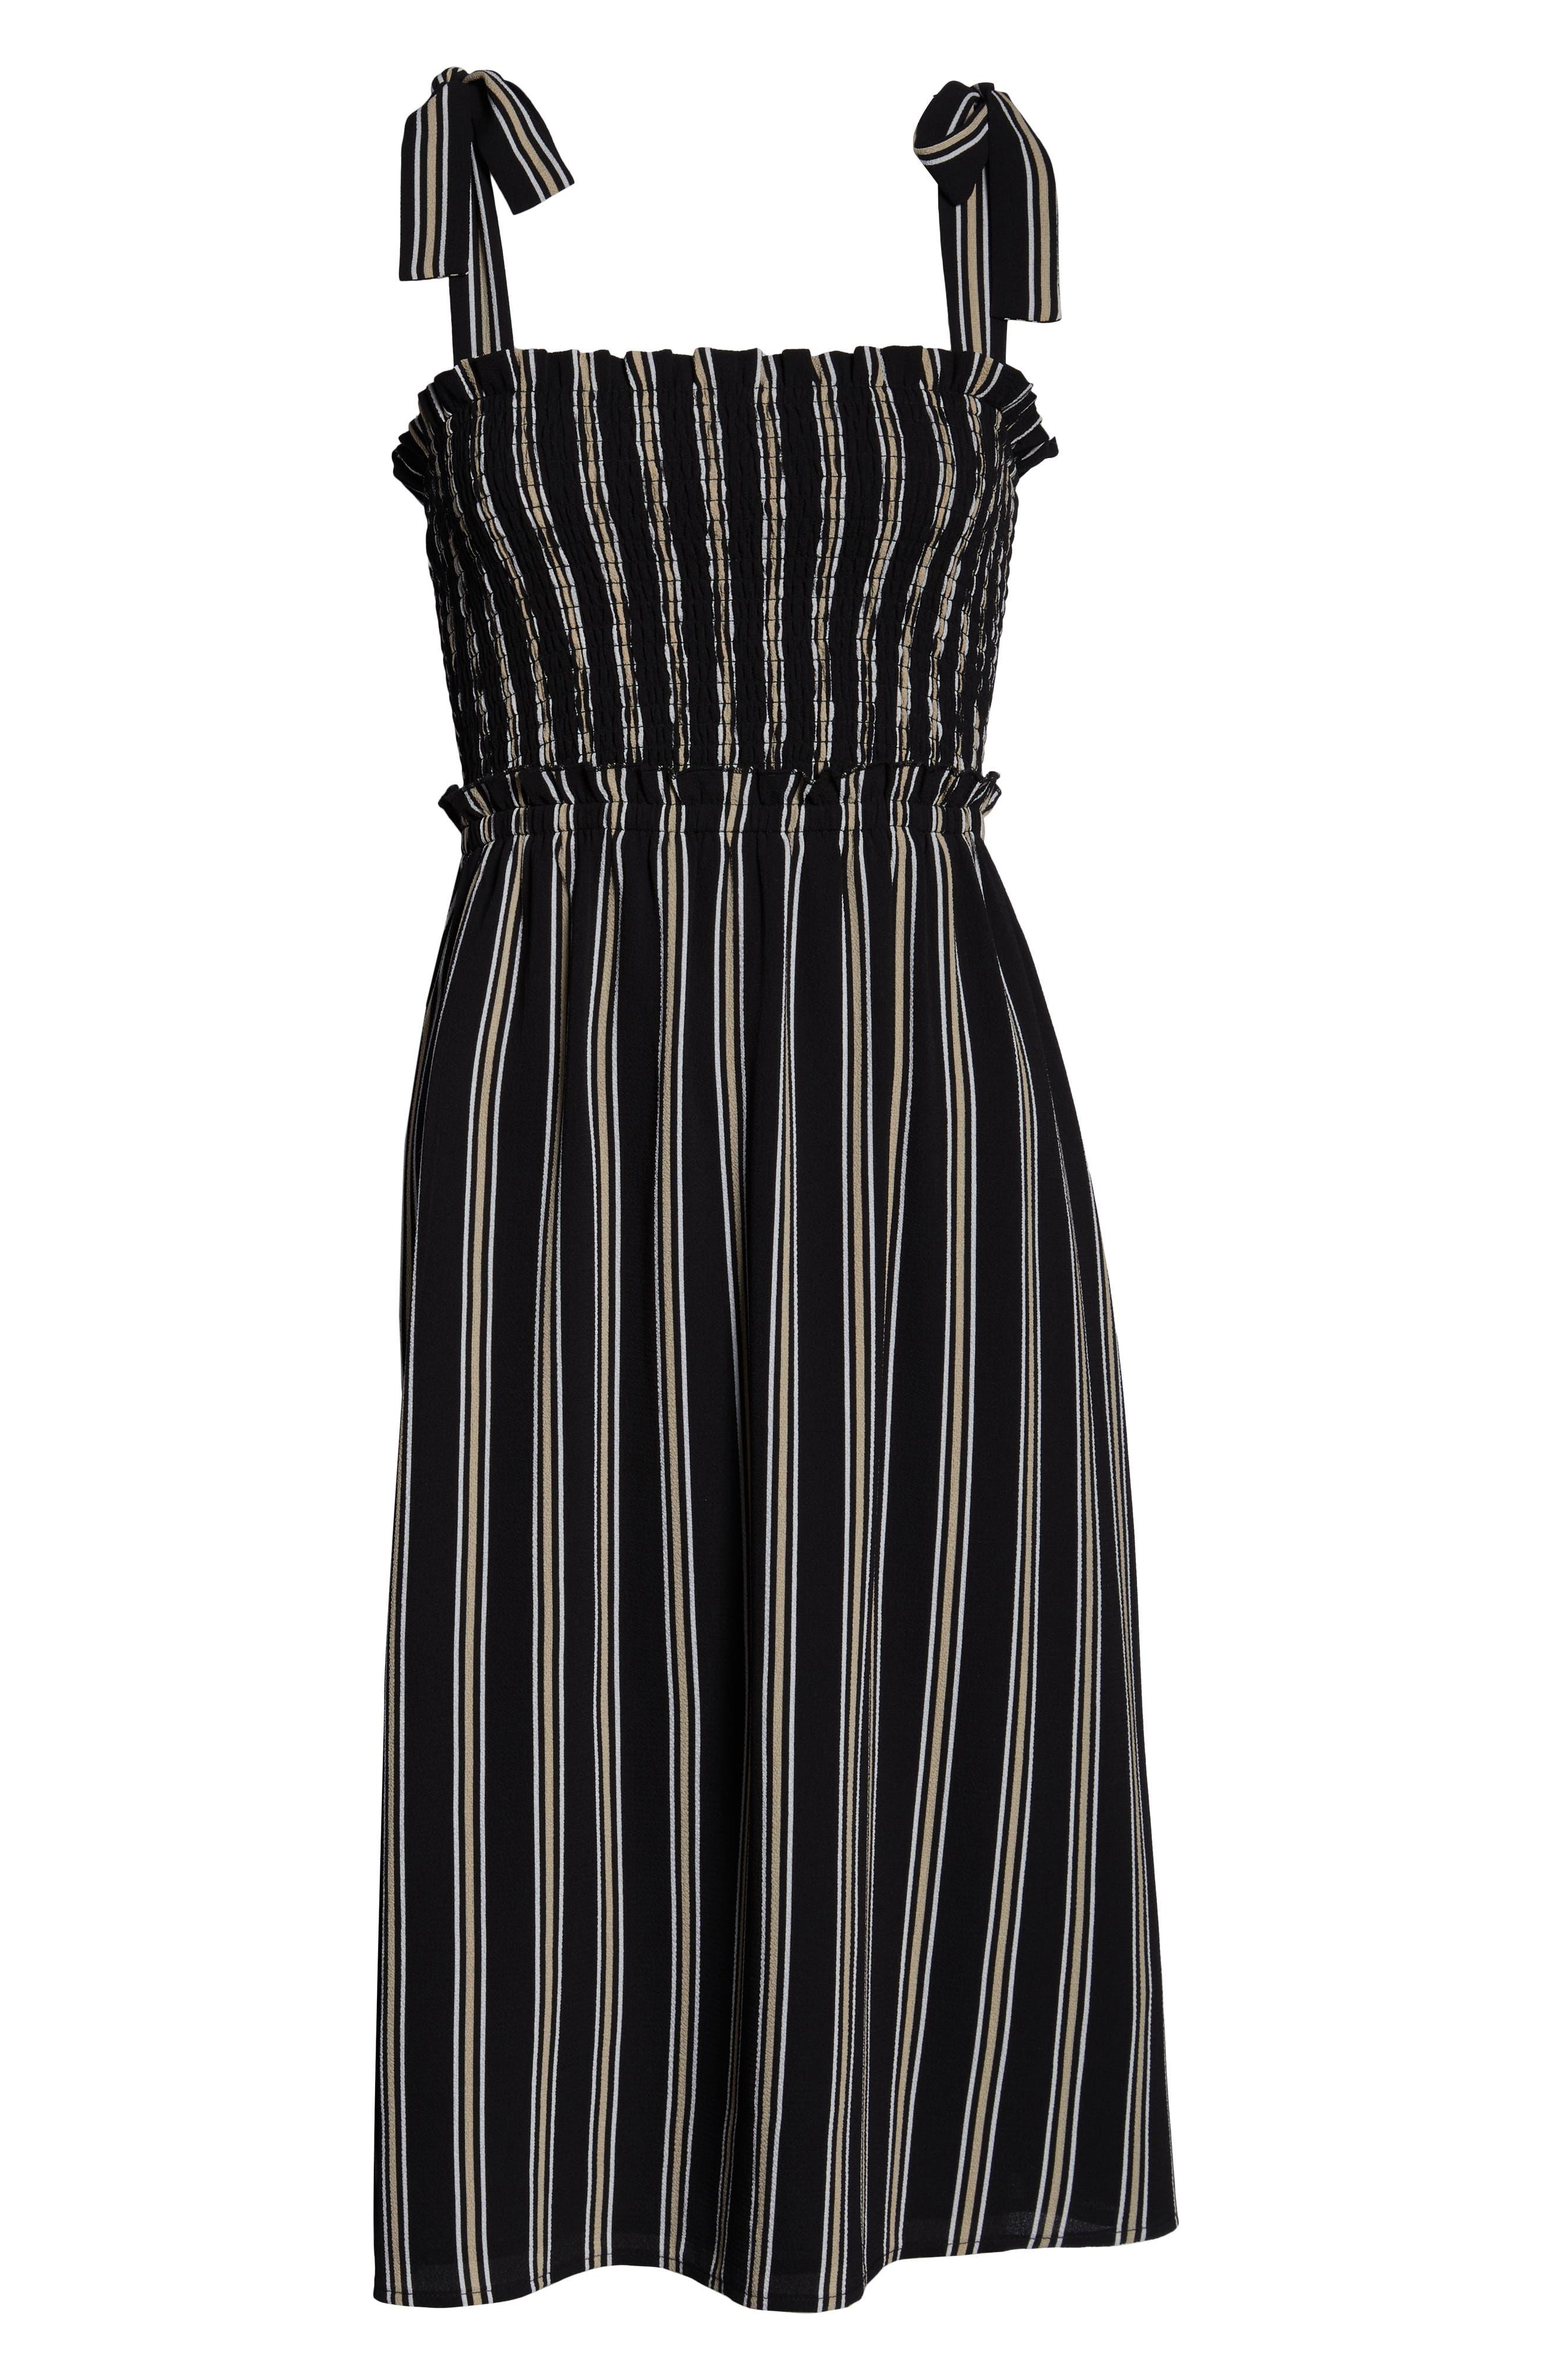 ALI & JAY, Tea for Two Crepe Dress, Alternate thumbnail 6, color, BLACK MULTI STRIPE